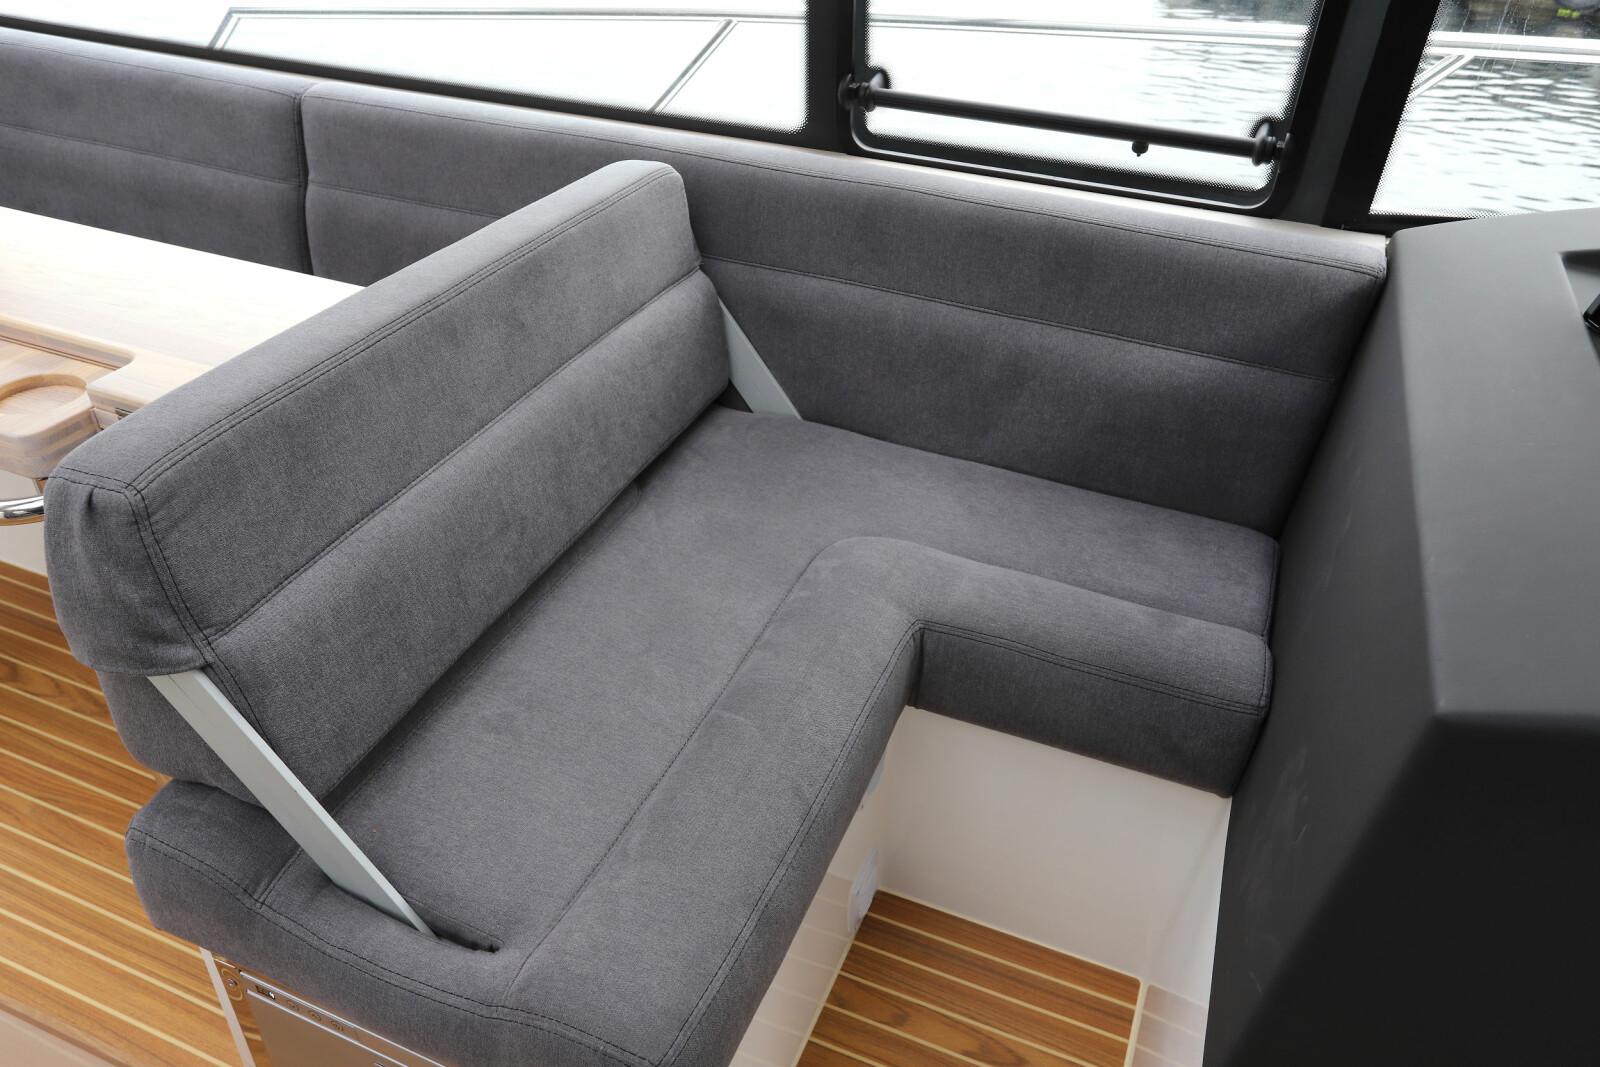 <b>I FARTSRETNING:</b> Den smarte avslutningen på sofagruppen sørger for at det er mange sitteplasser i fartsretningen.